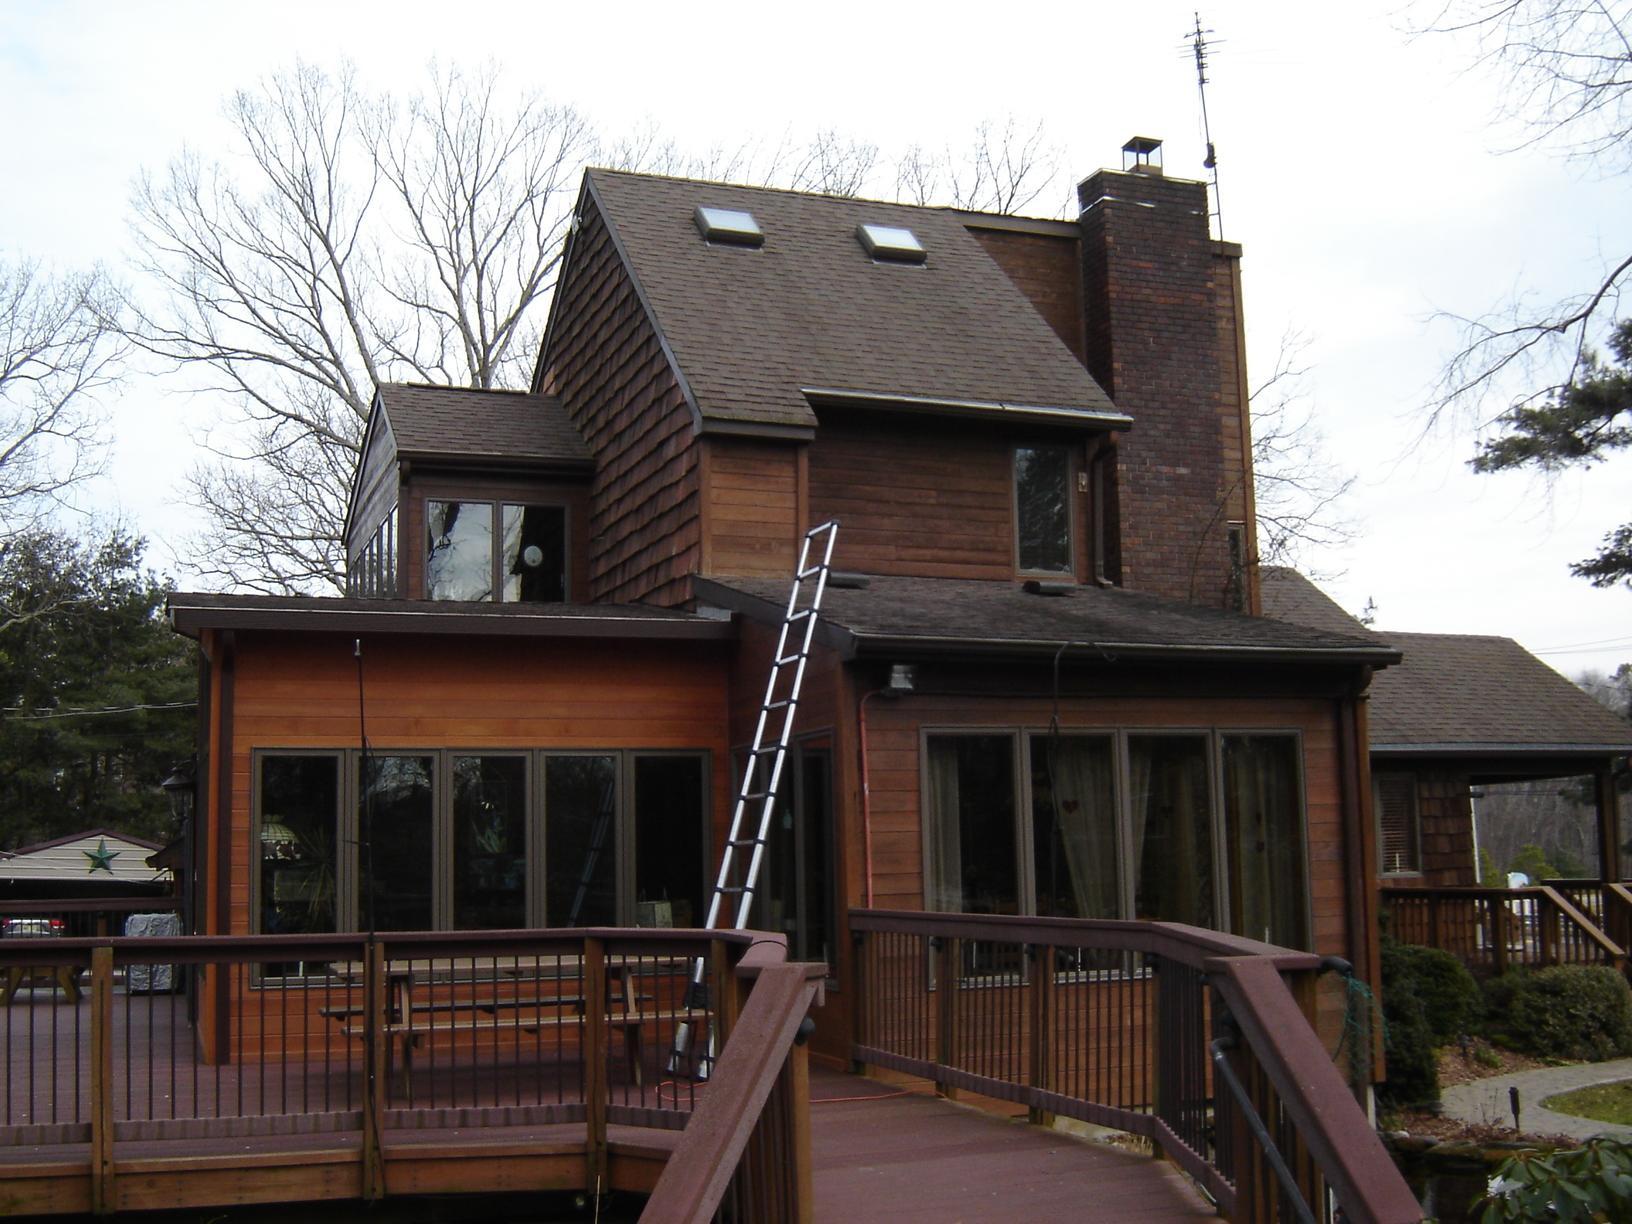 Before Photo of Asphalt Shingles on Rustic Home